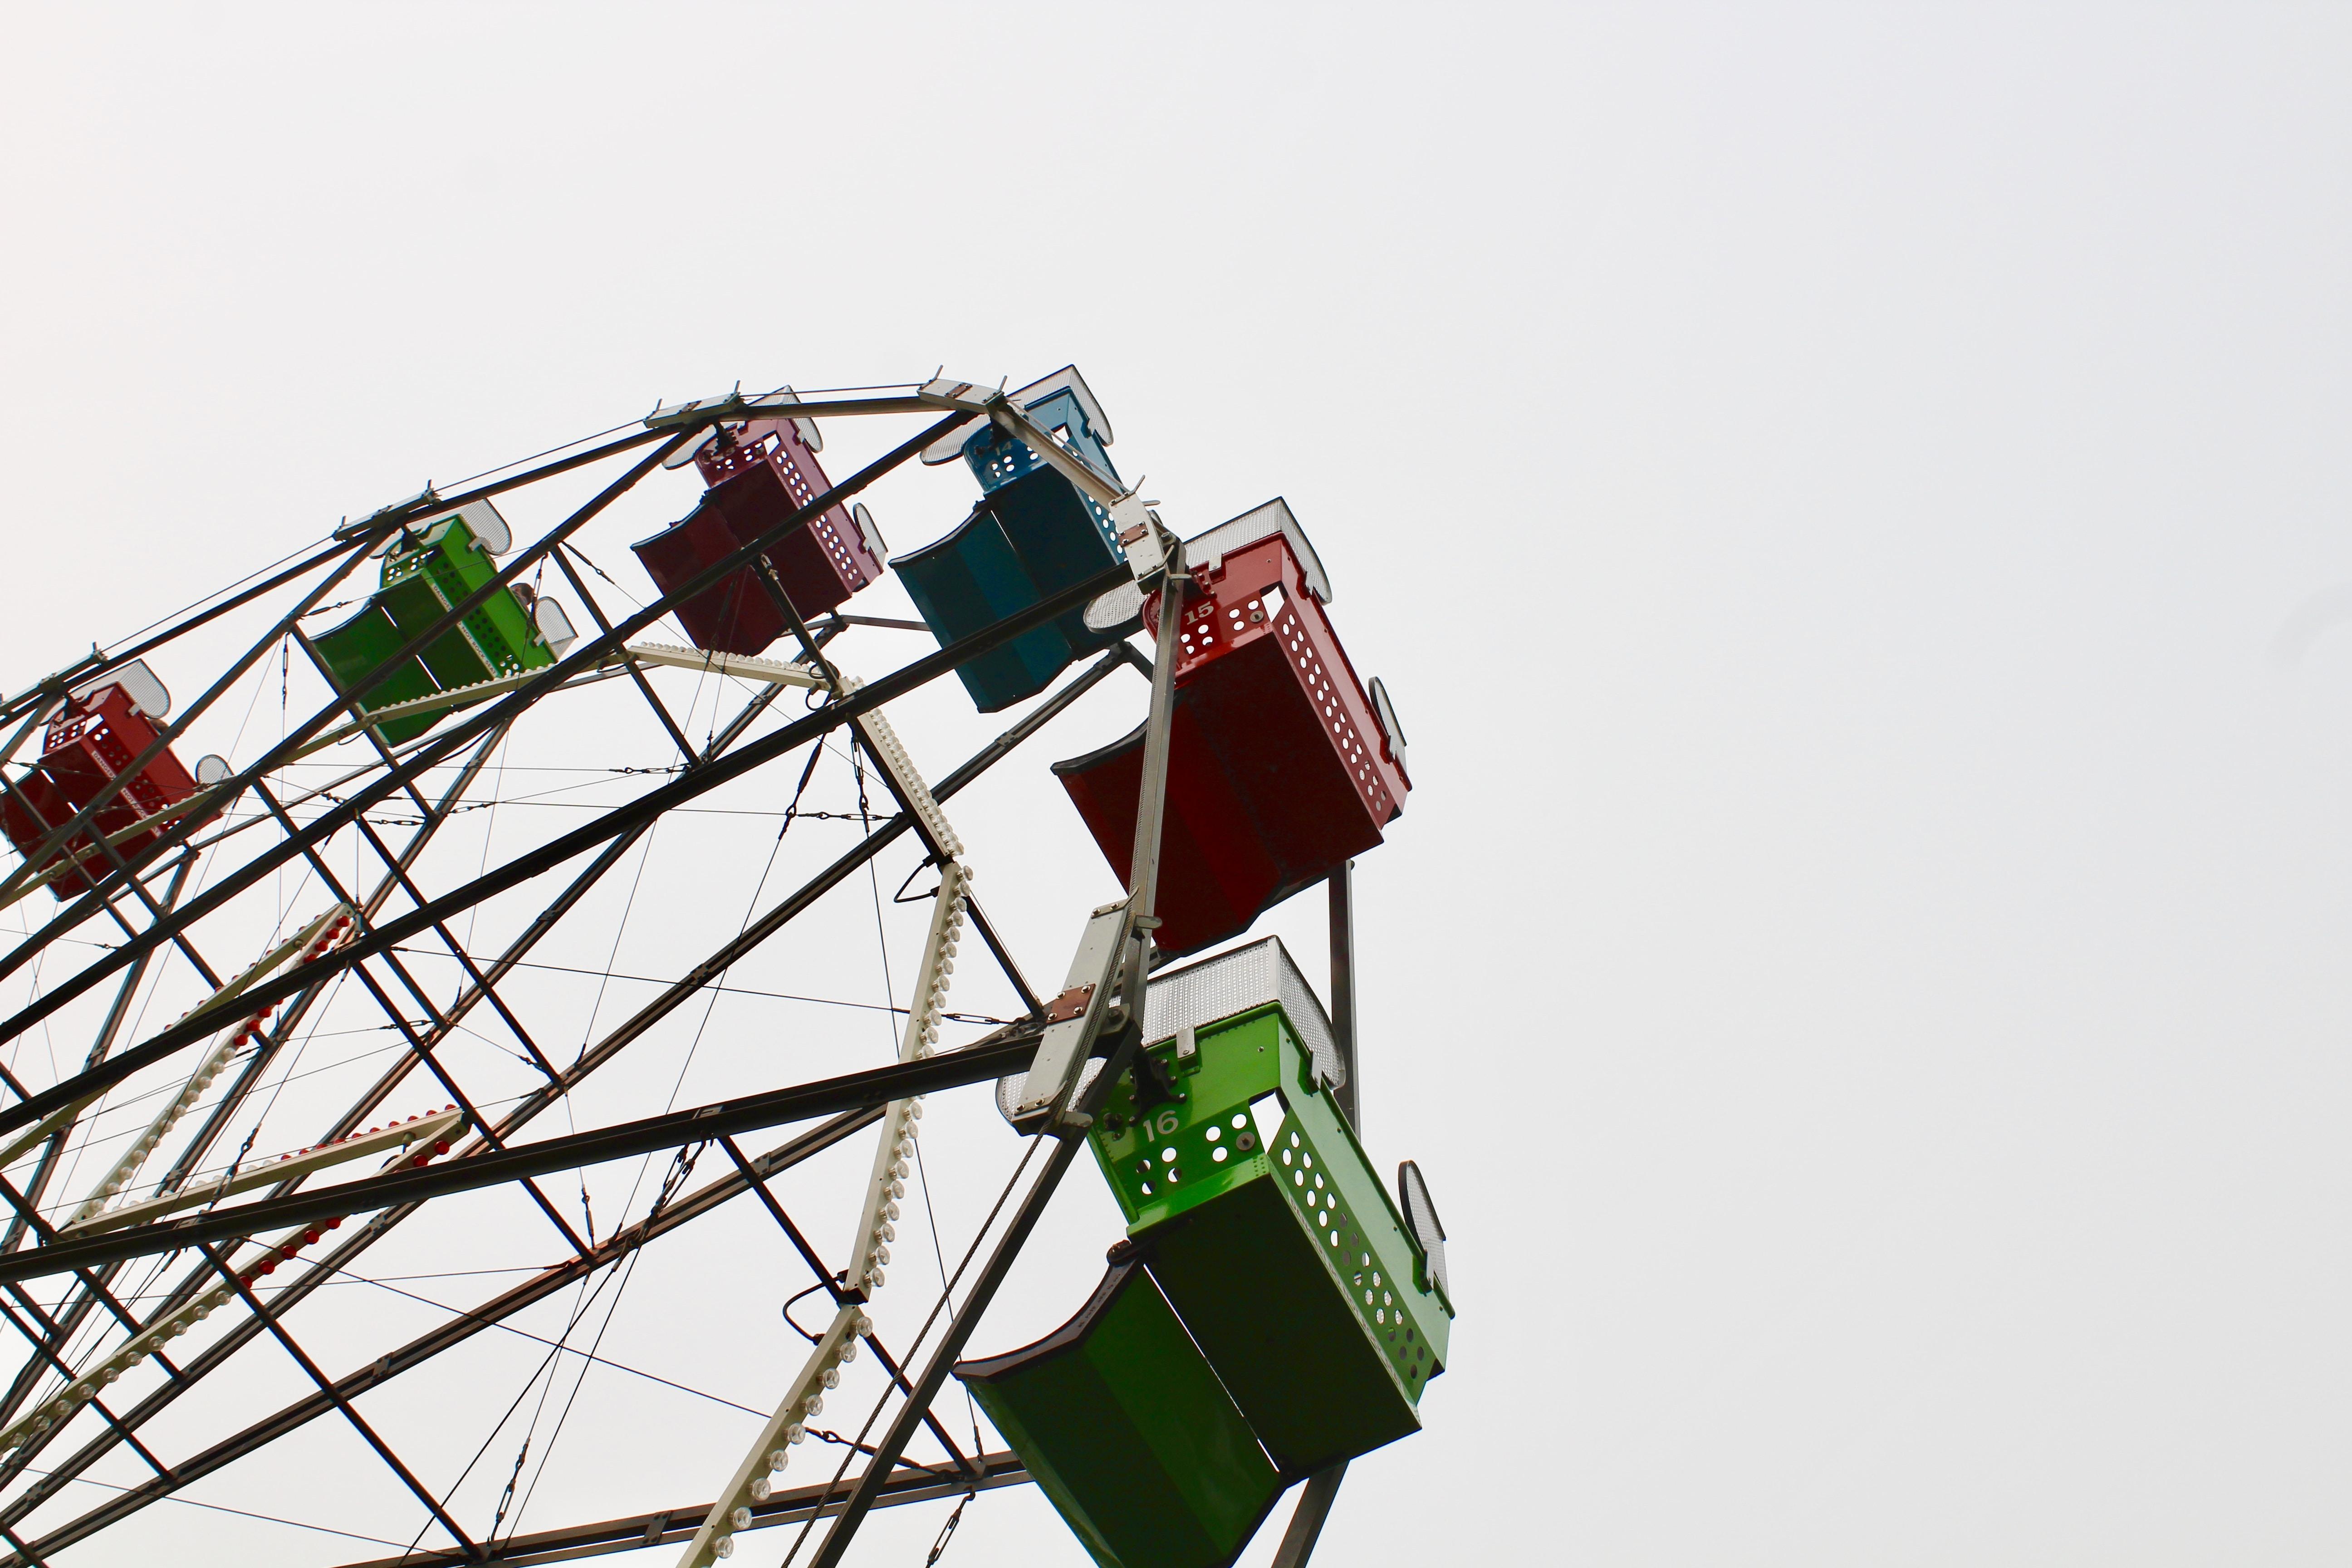 multicolored ferries wheel under white sky